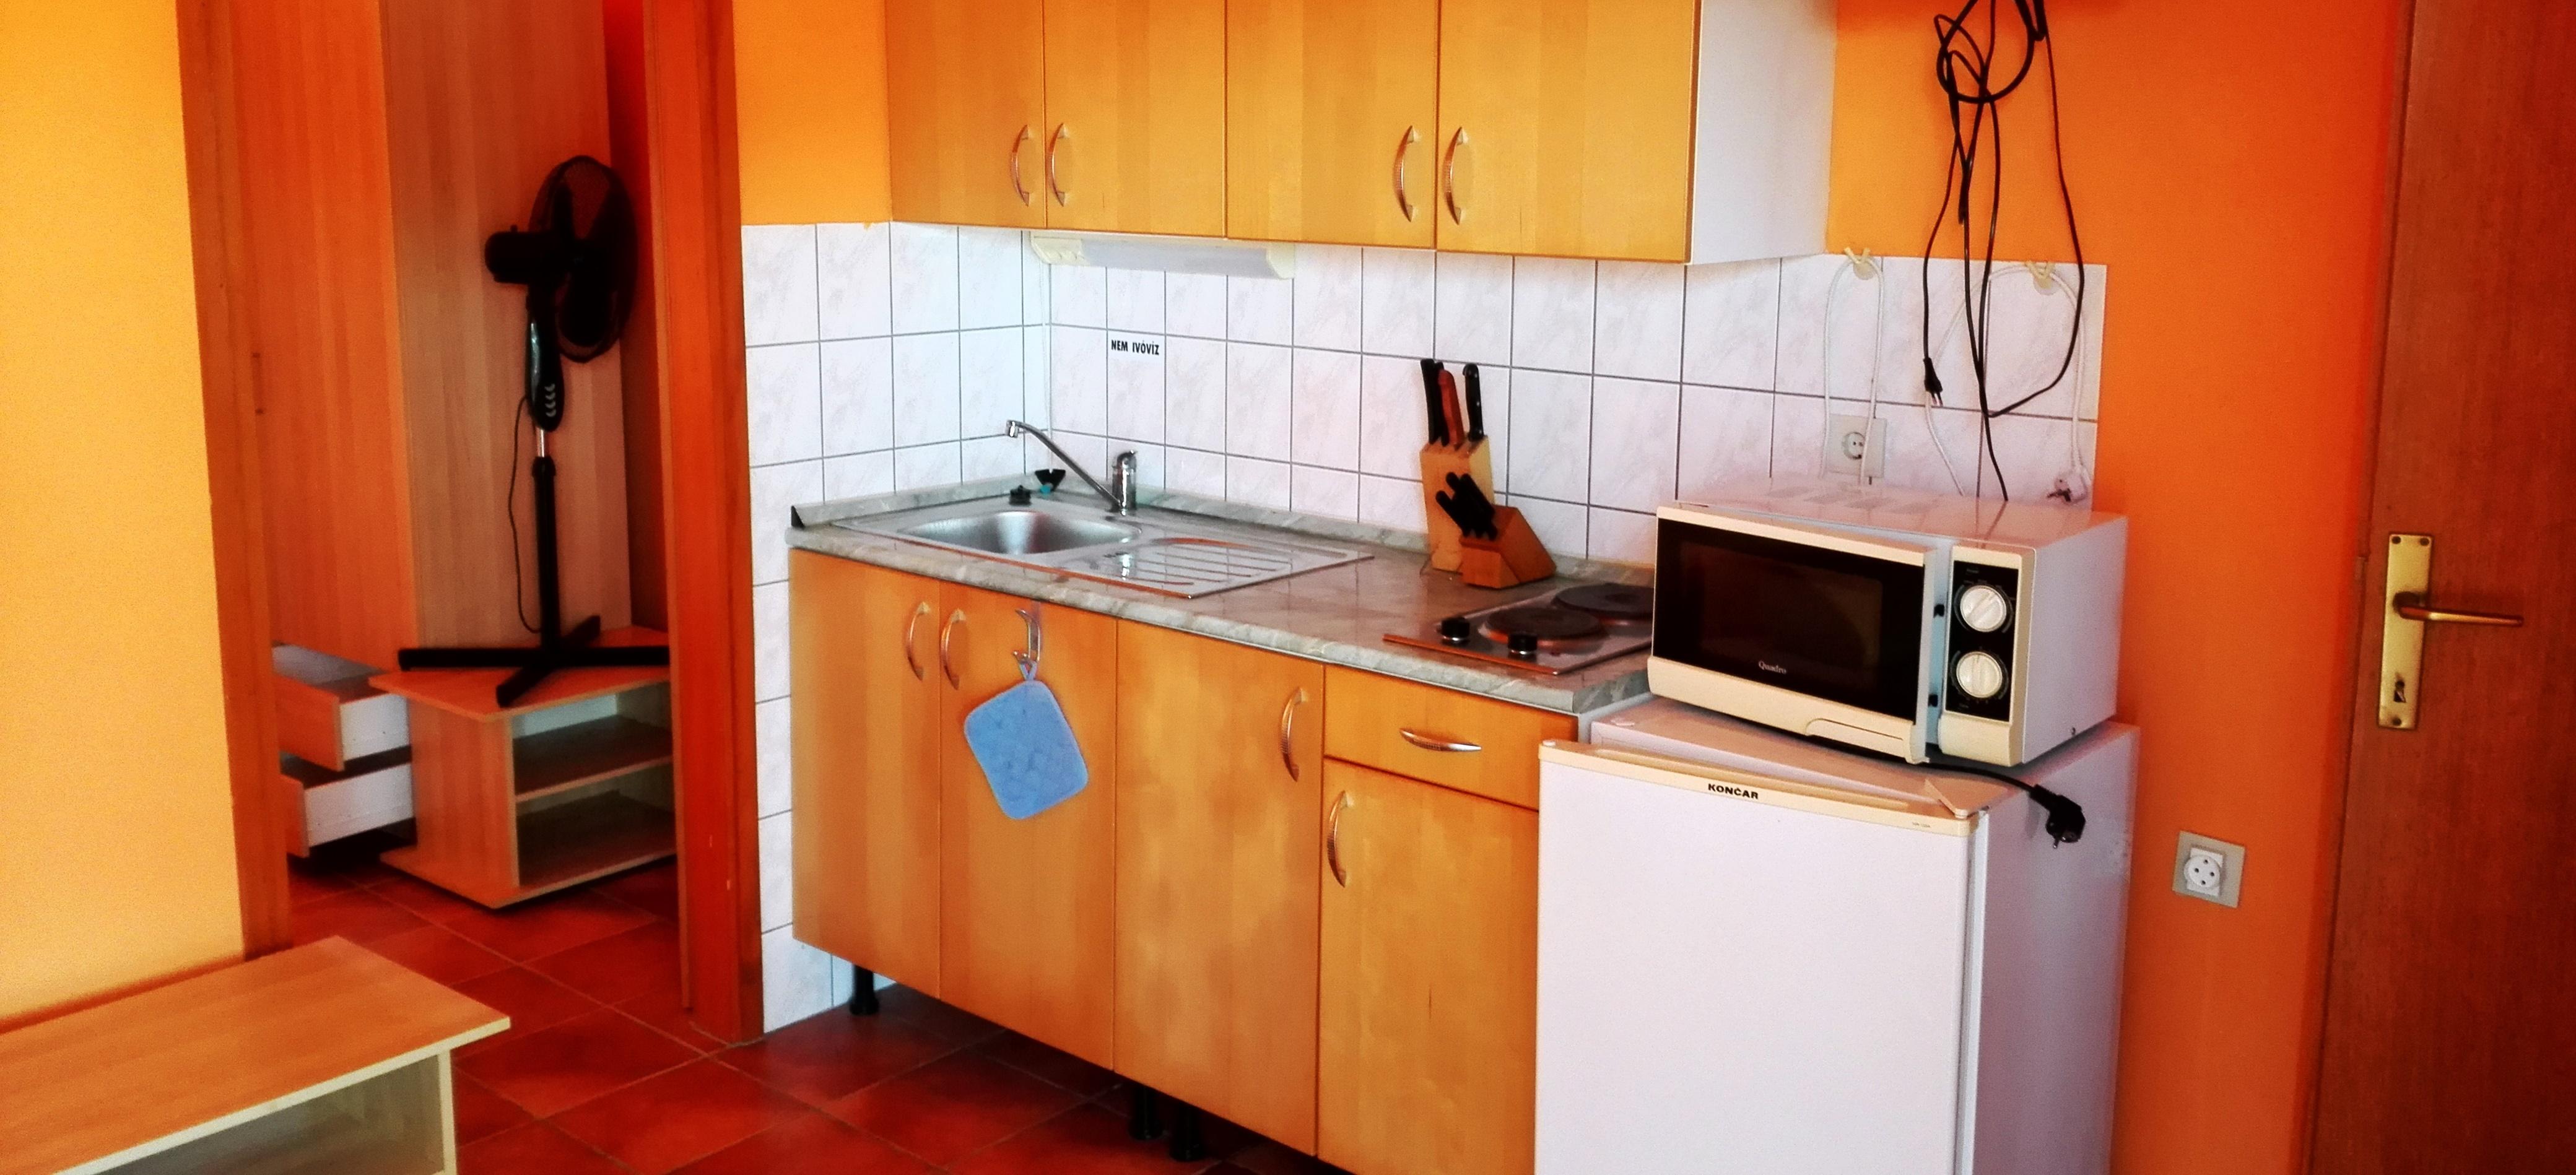 Vir szigeti apartman konyha